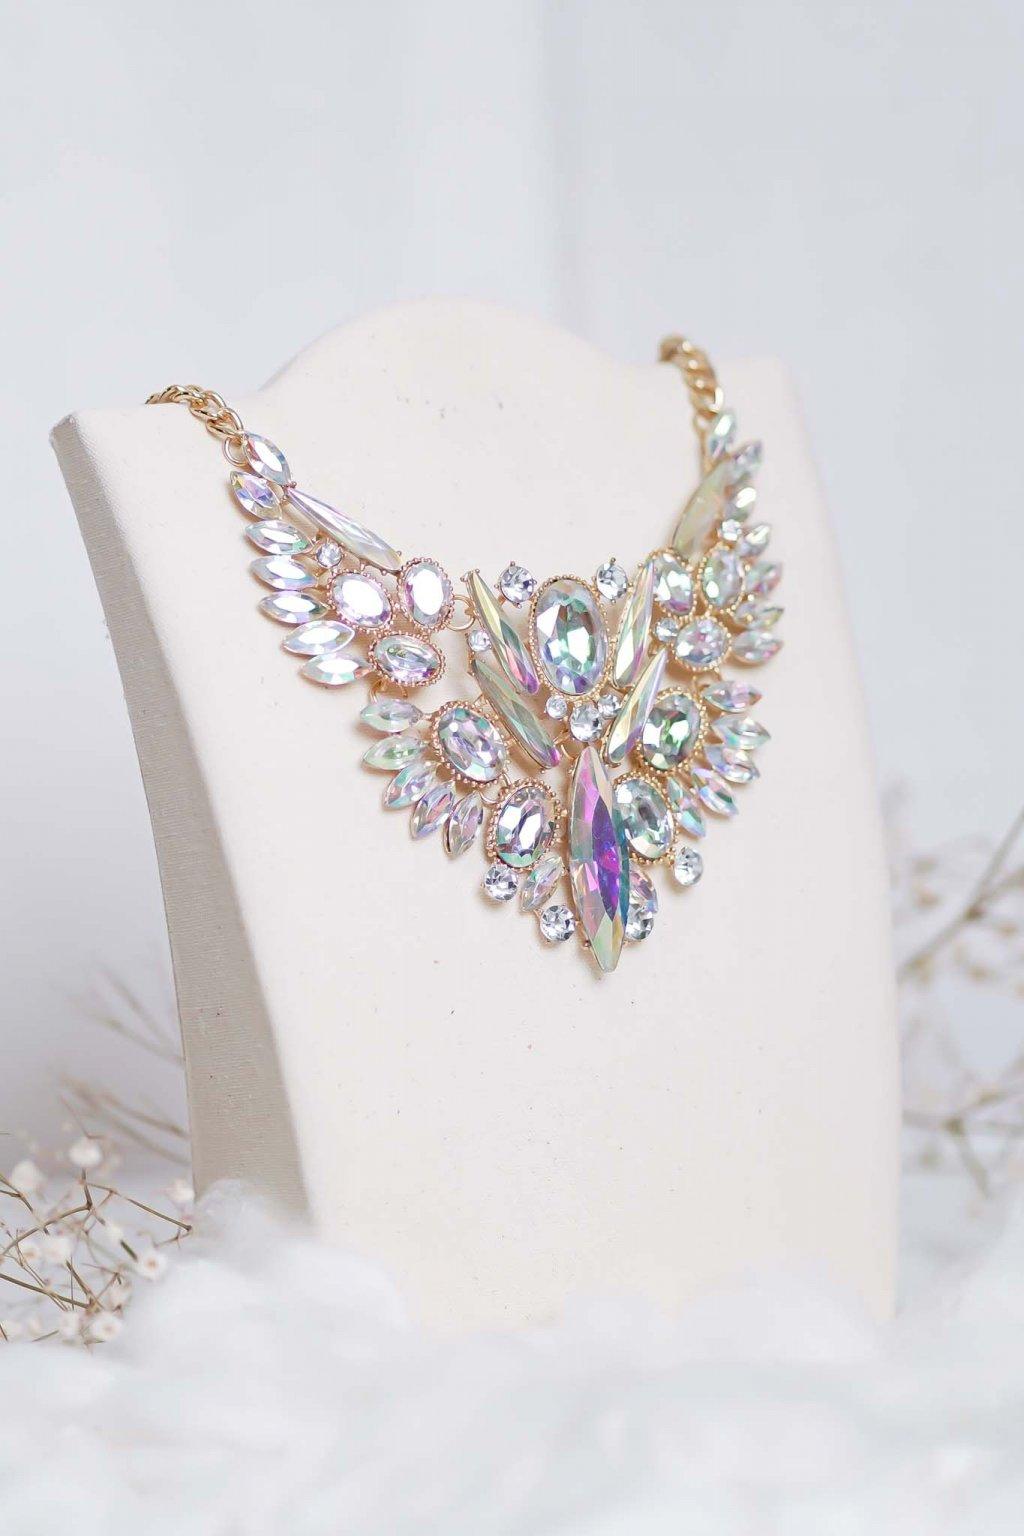 náhrdelník, šperk, spoločenská náhrdelník, náhrdelník na bežný deň, výrazný náhrdelník, jemný náhrdelník, šperky, náhrdelník na ples, svadbu, stužkovú 75